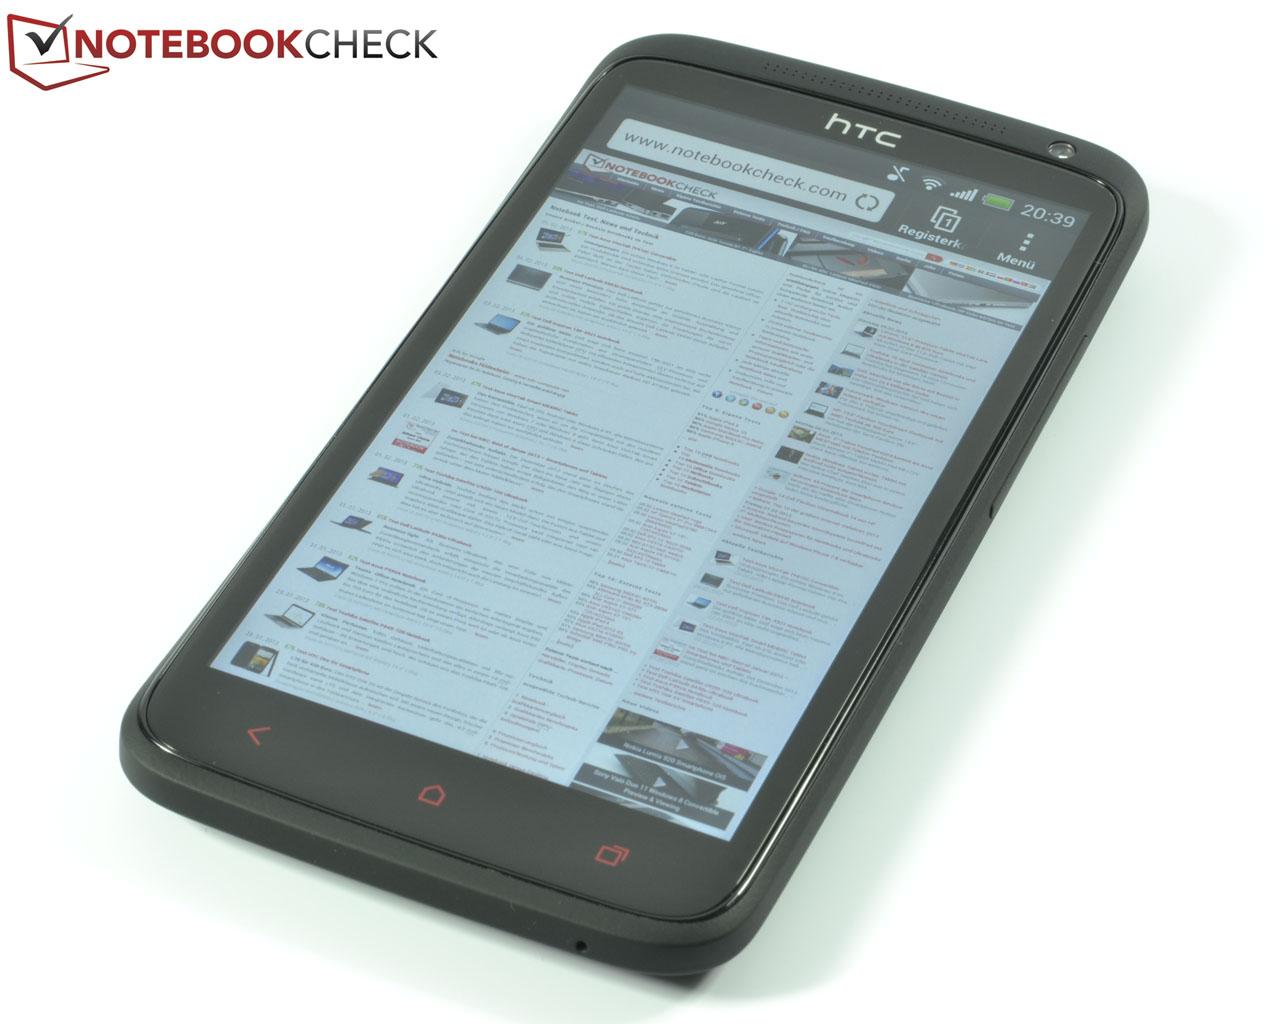 HTC One X+ Smartphone